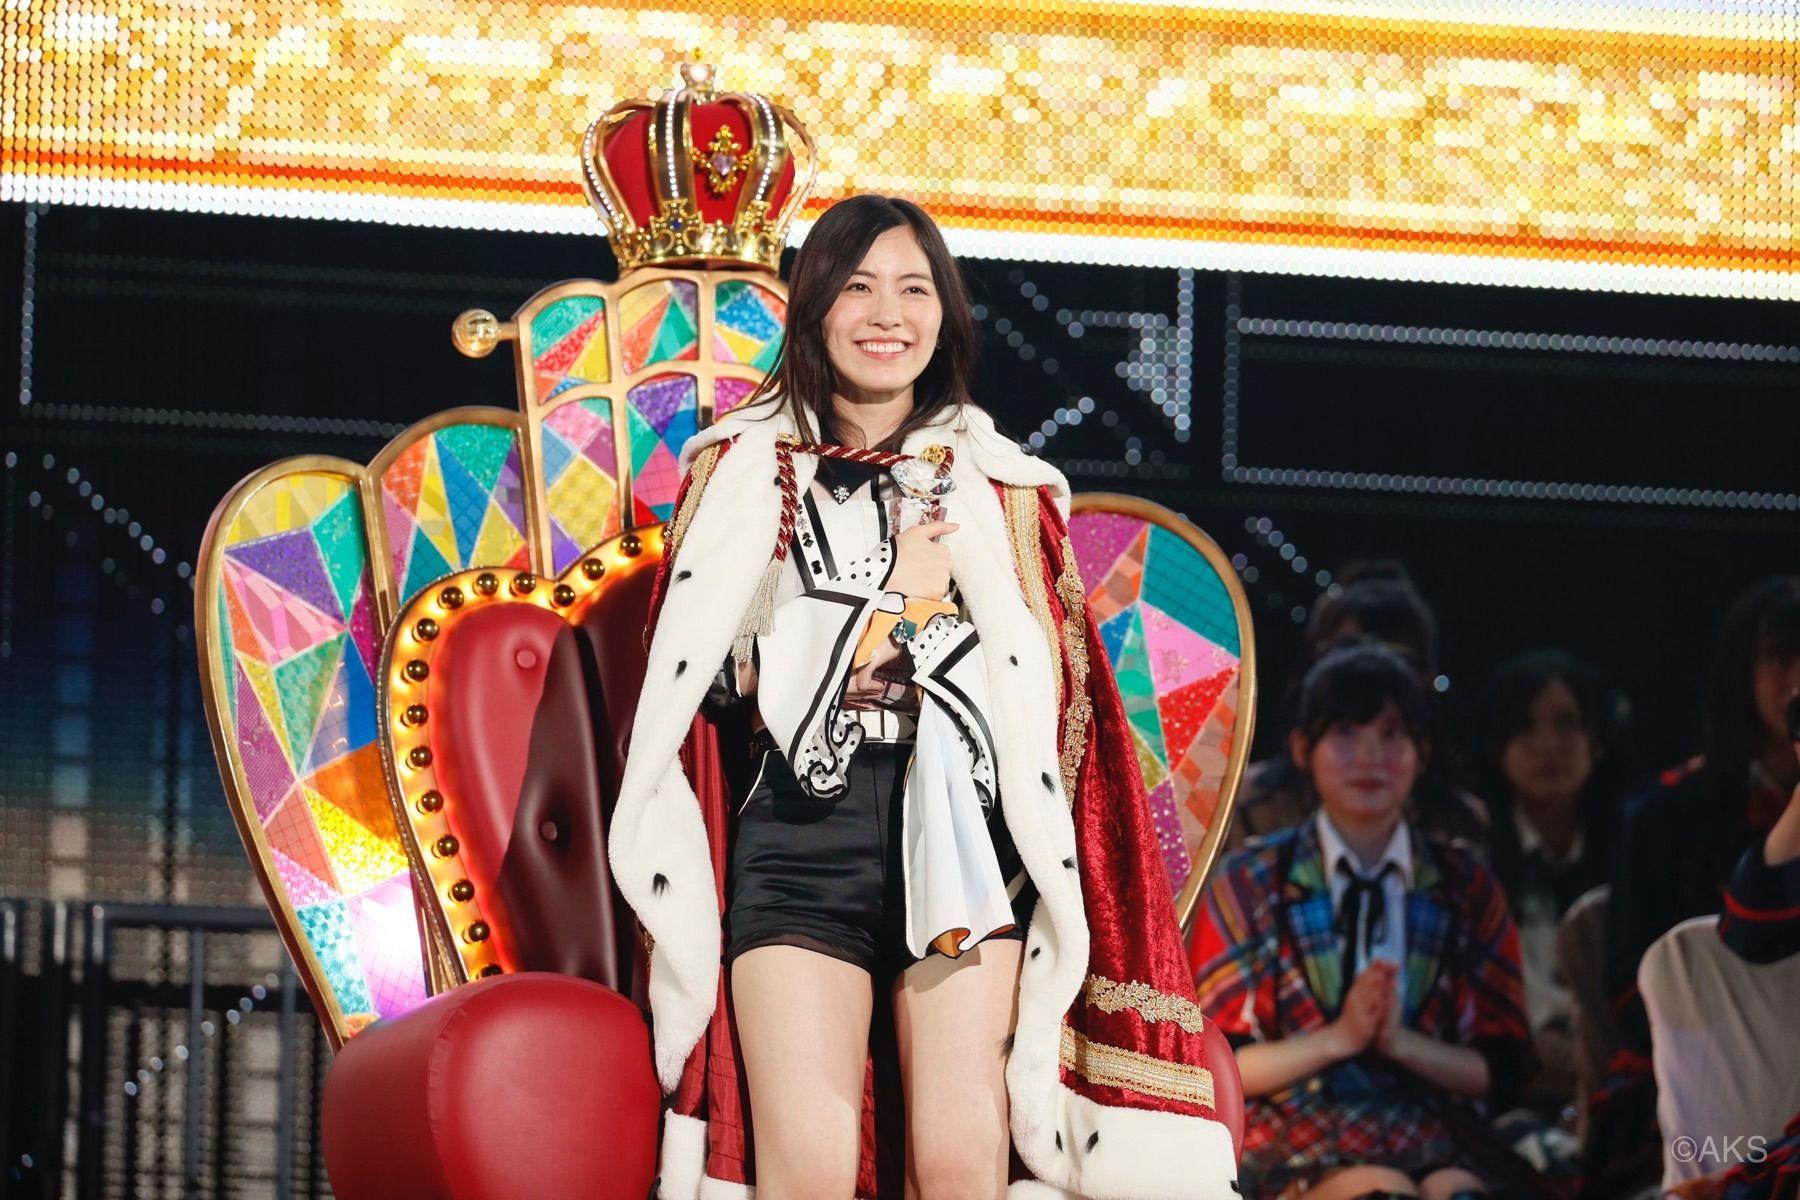 Article] Jurina Matsui Crowned the Center of the World! SKE48 Claims Top  Two Spots at AKB48 World Senbatsu Sousenkyo in Hometown Nagoya! | Japanese  kawaii idol… | กราฟิก